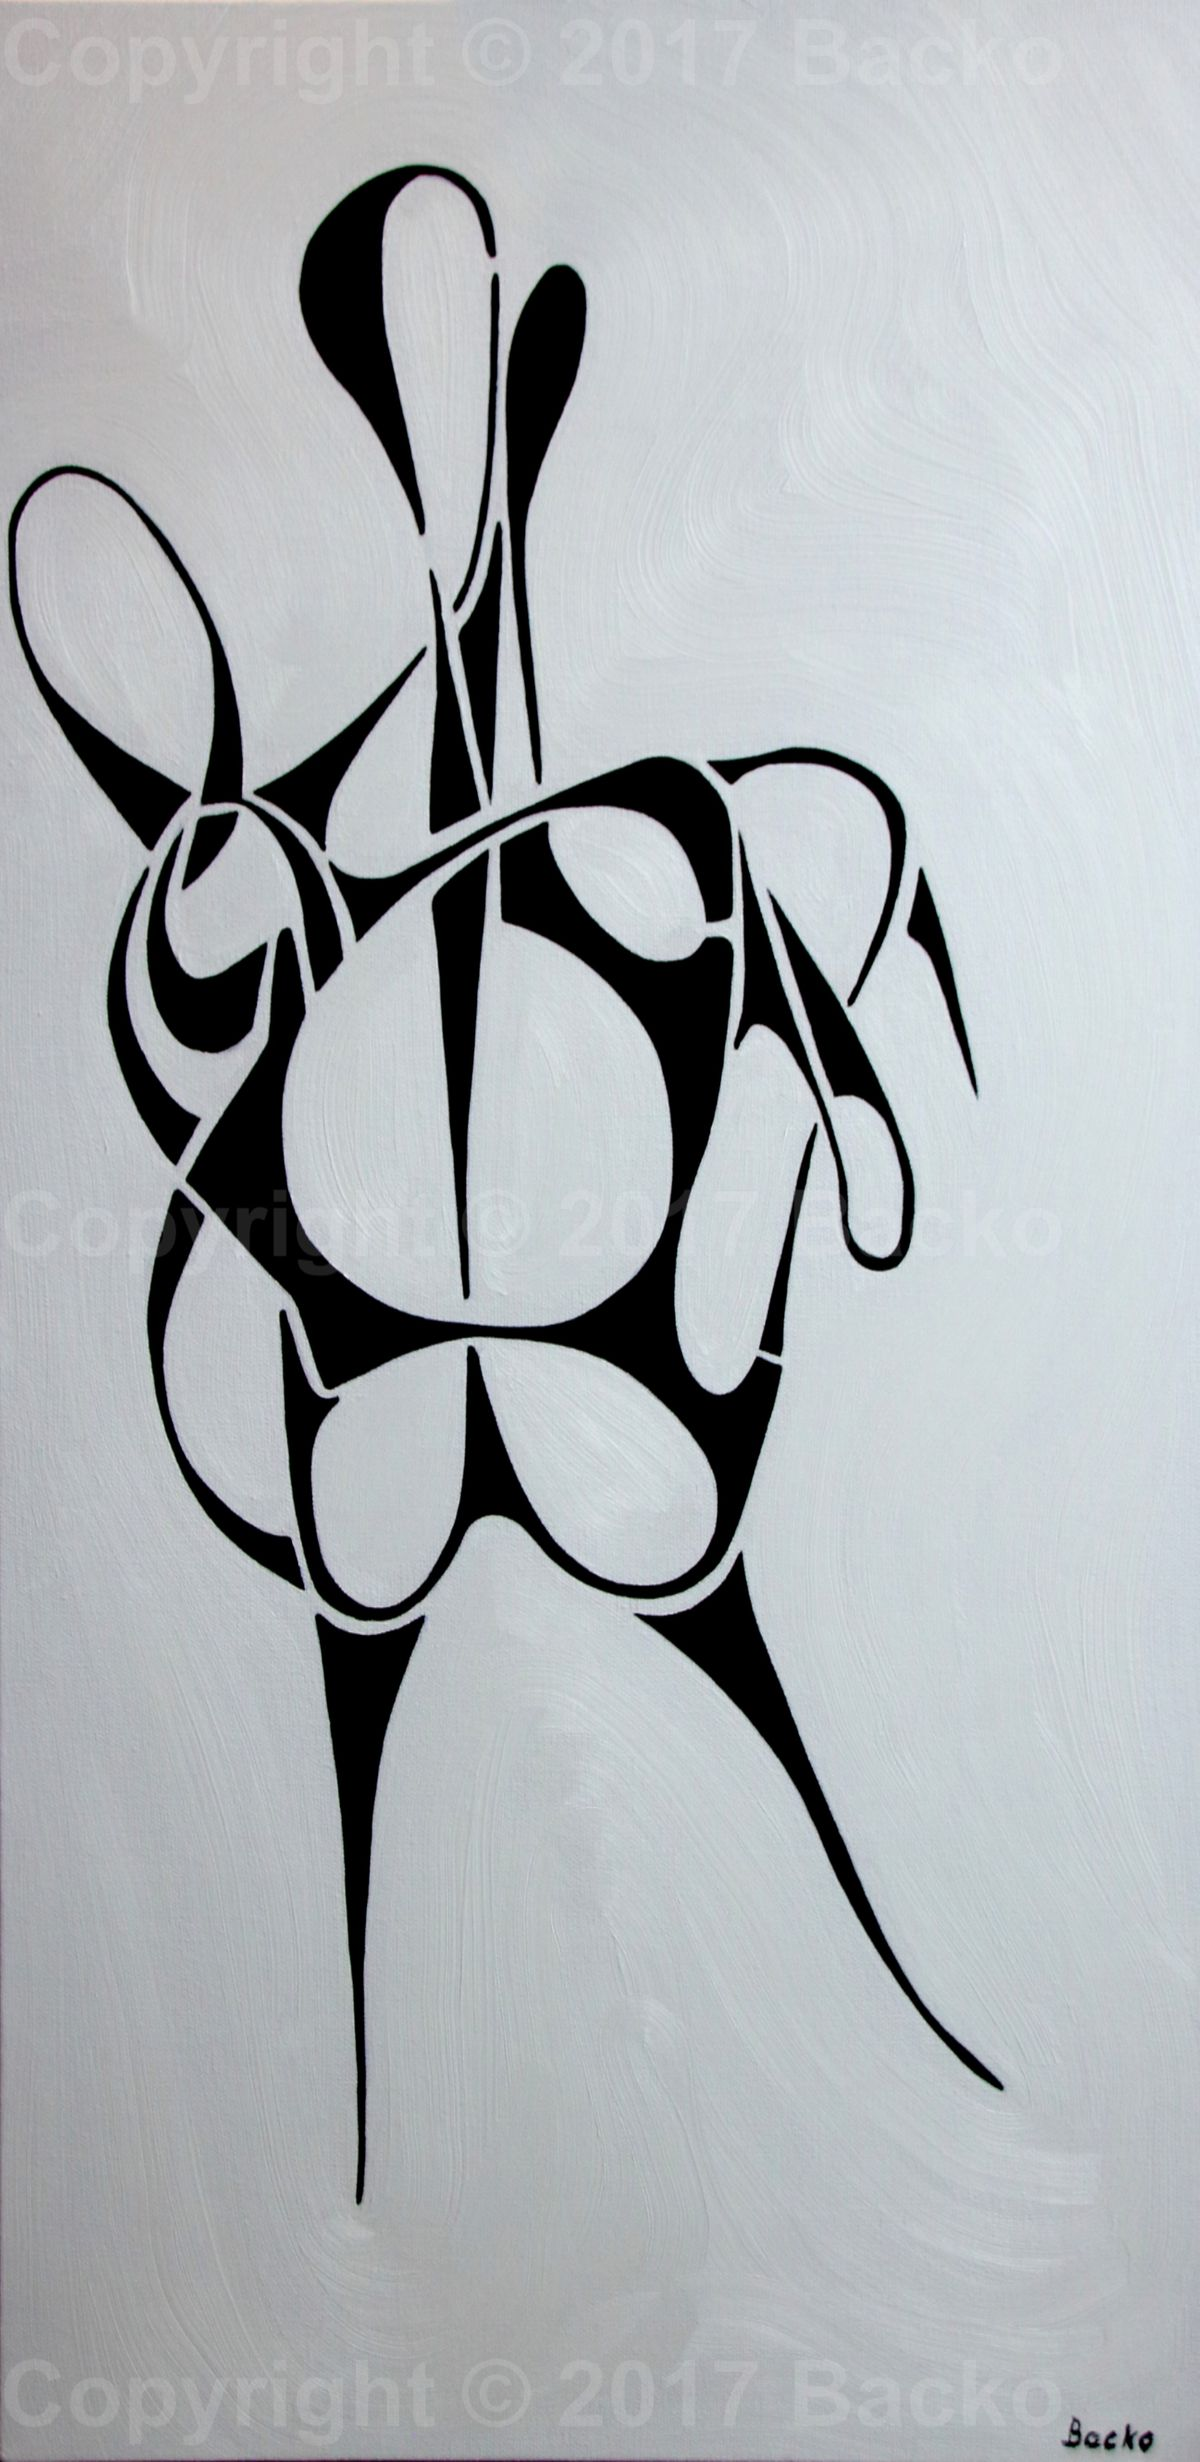 Symbiosis triptych - part three